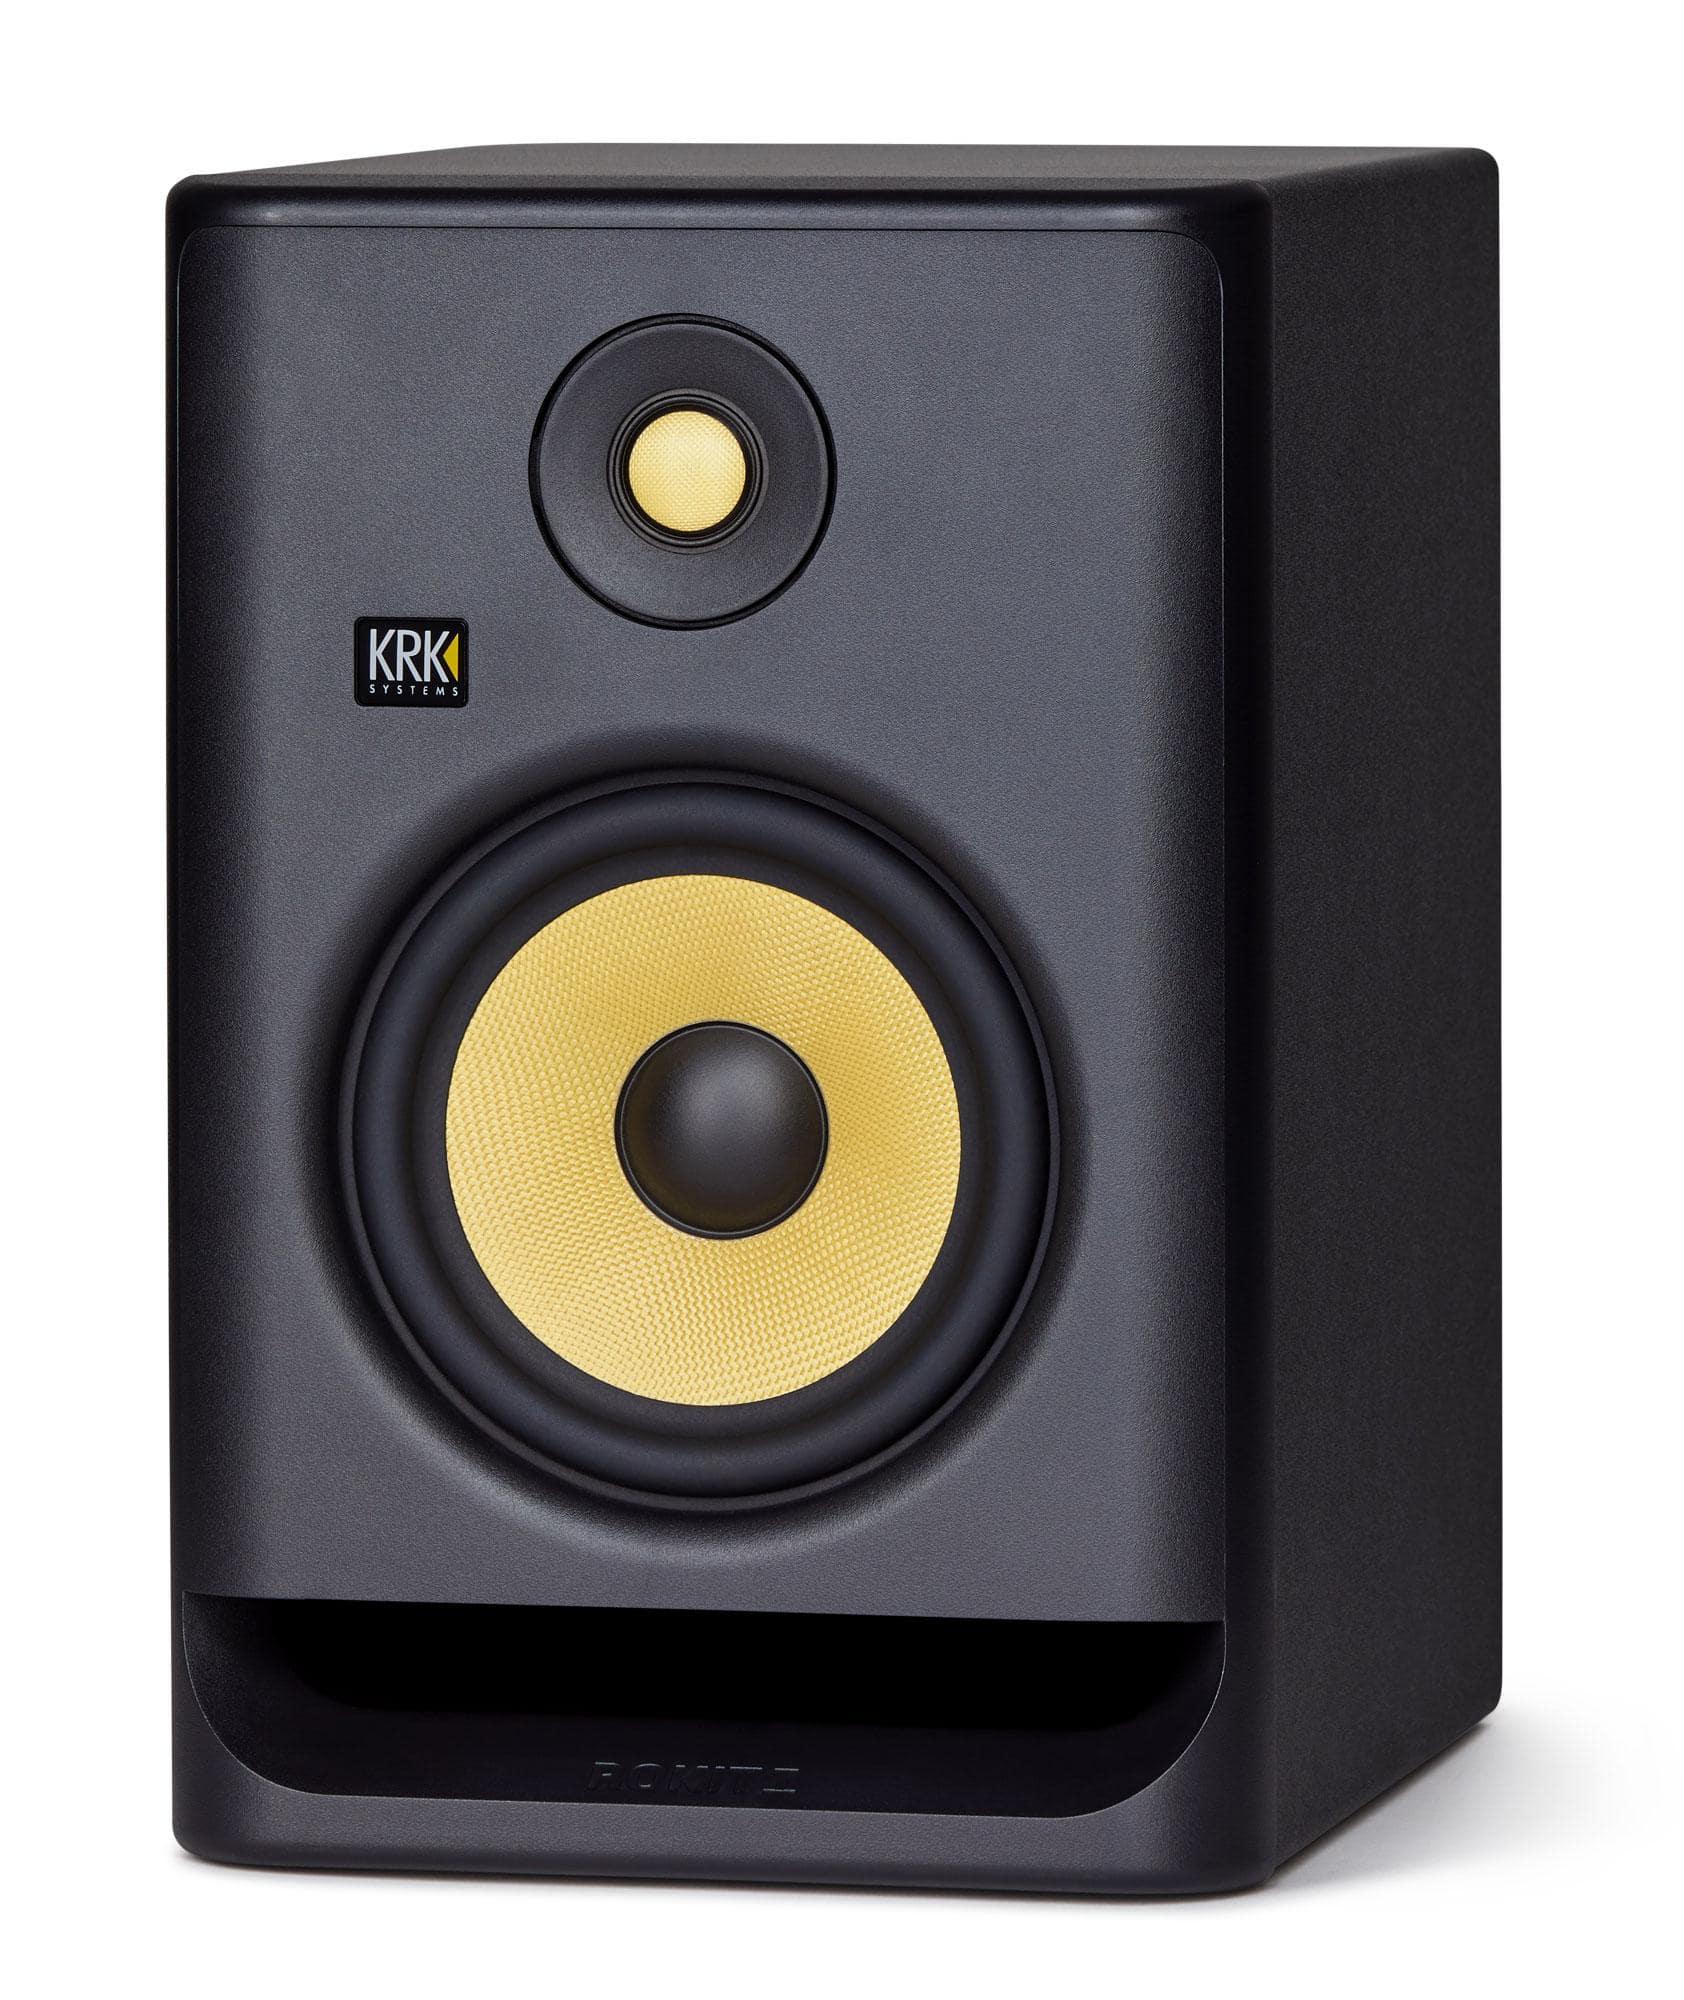 Studiomonitore - KRK ROKIT RP7 G4 - Onlineshop Musikhaus Kirstein